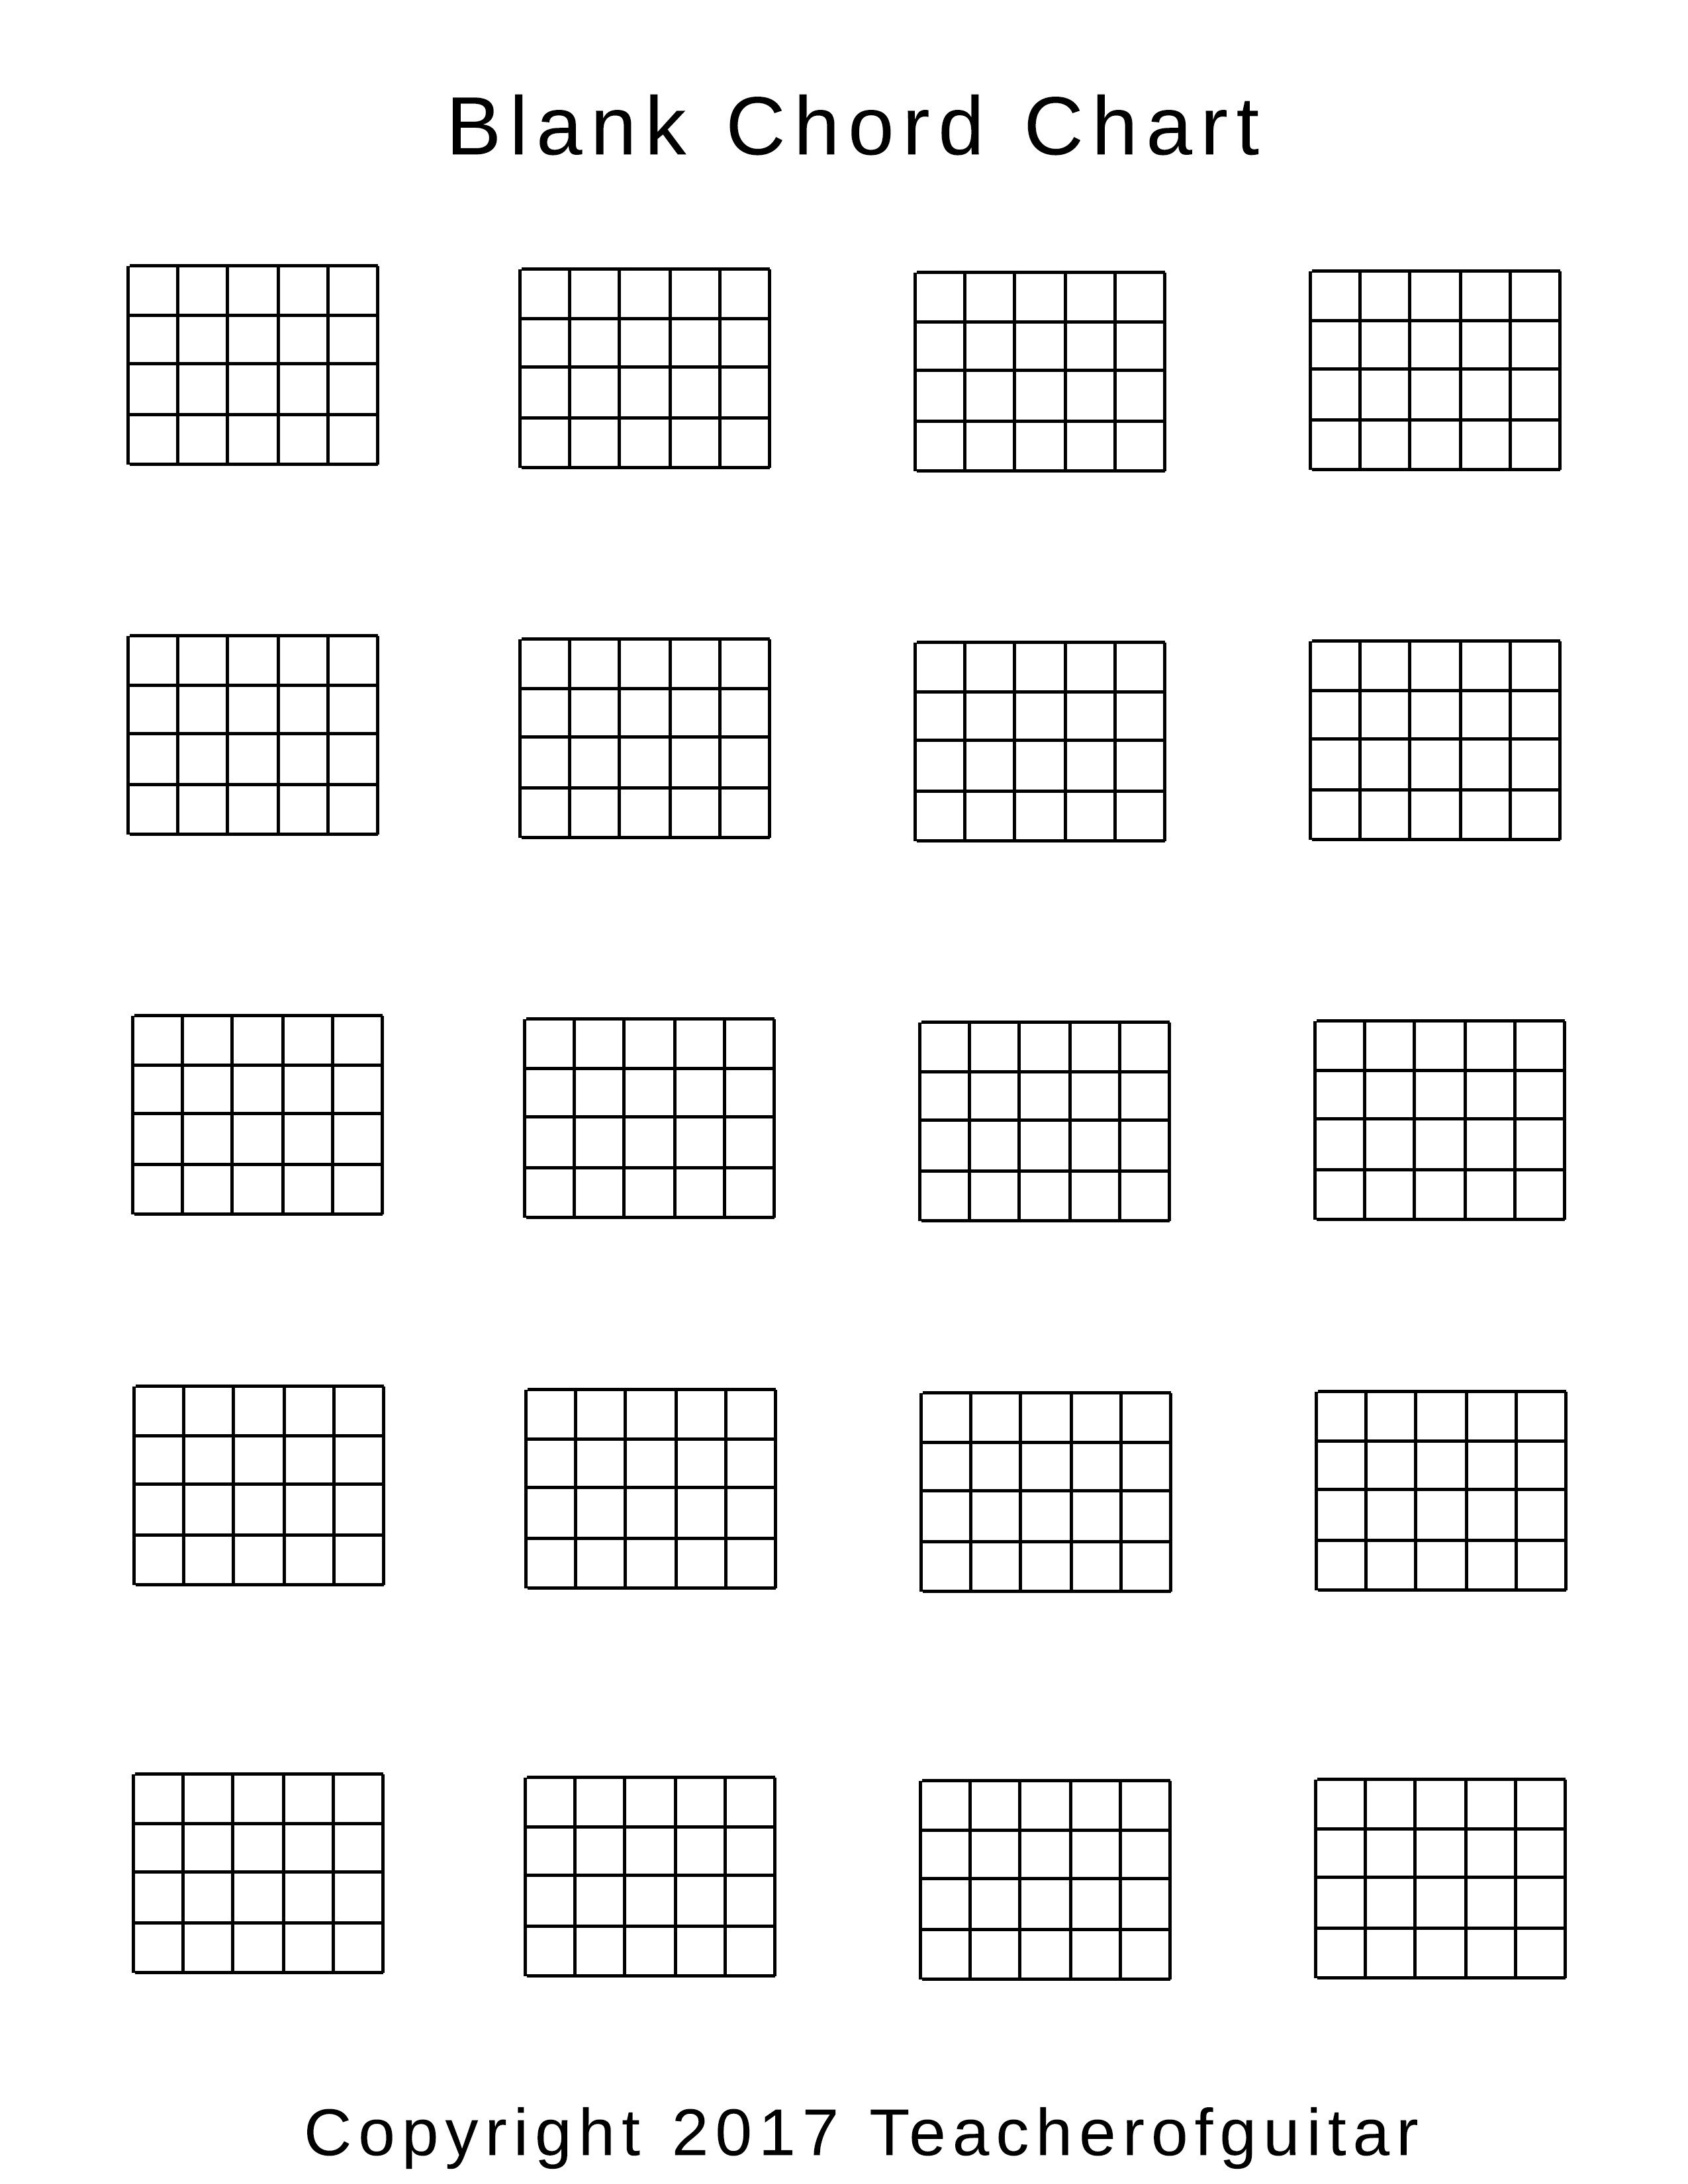 Blank Chord Chart Teacher of Guitar